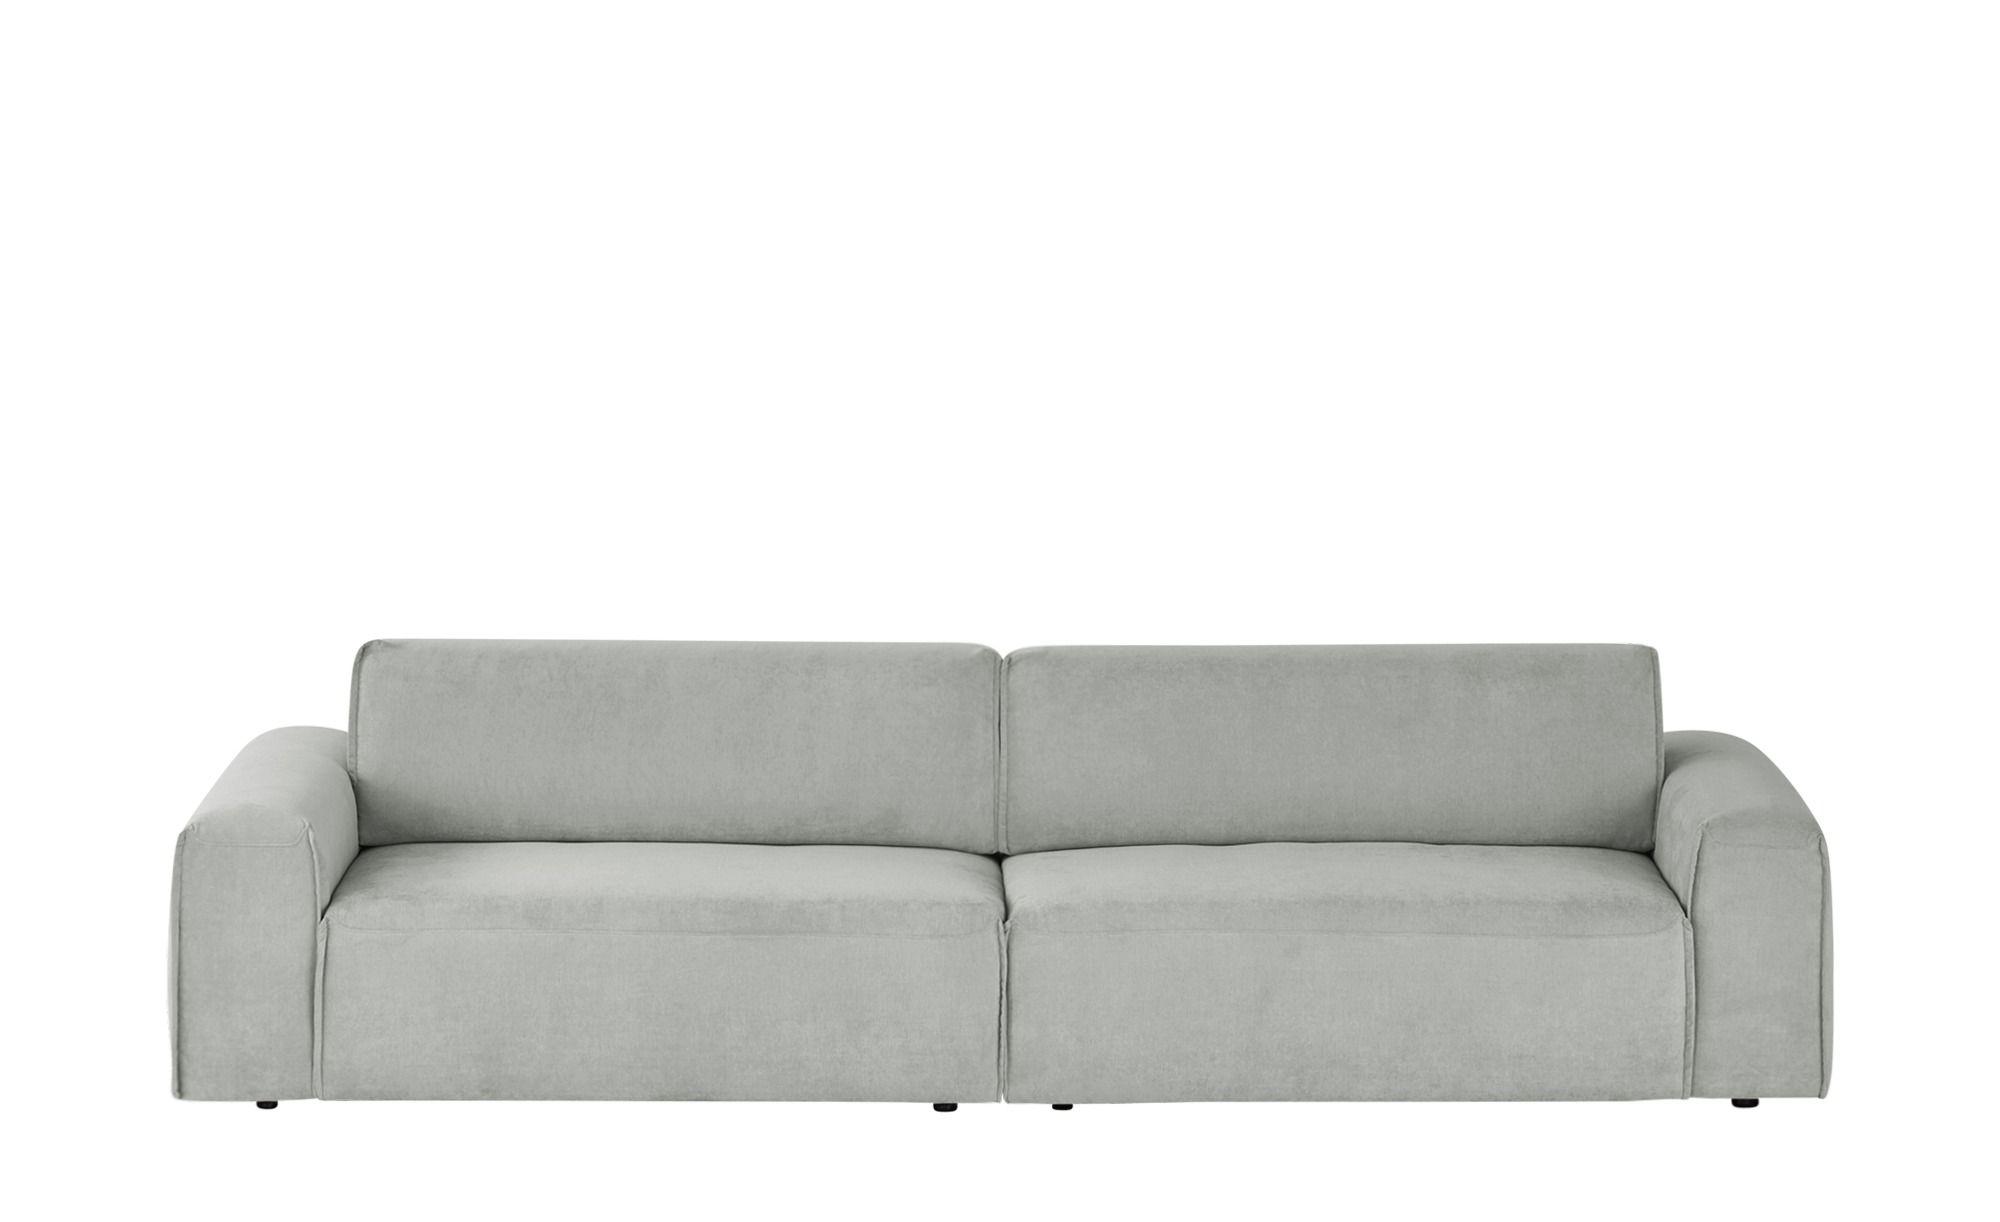 Max Schelling Big Sofa Life In 2020 Grosse Sofas Sofa Und Hoffner